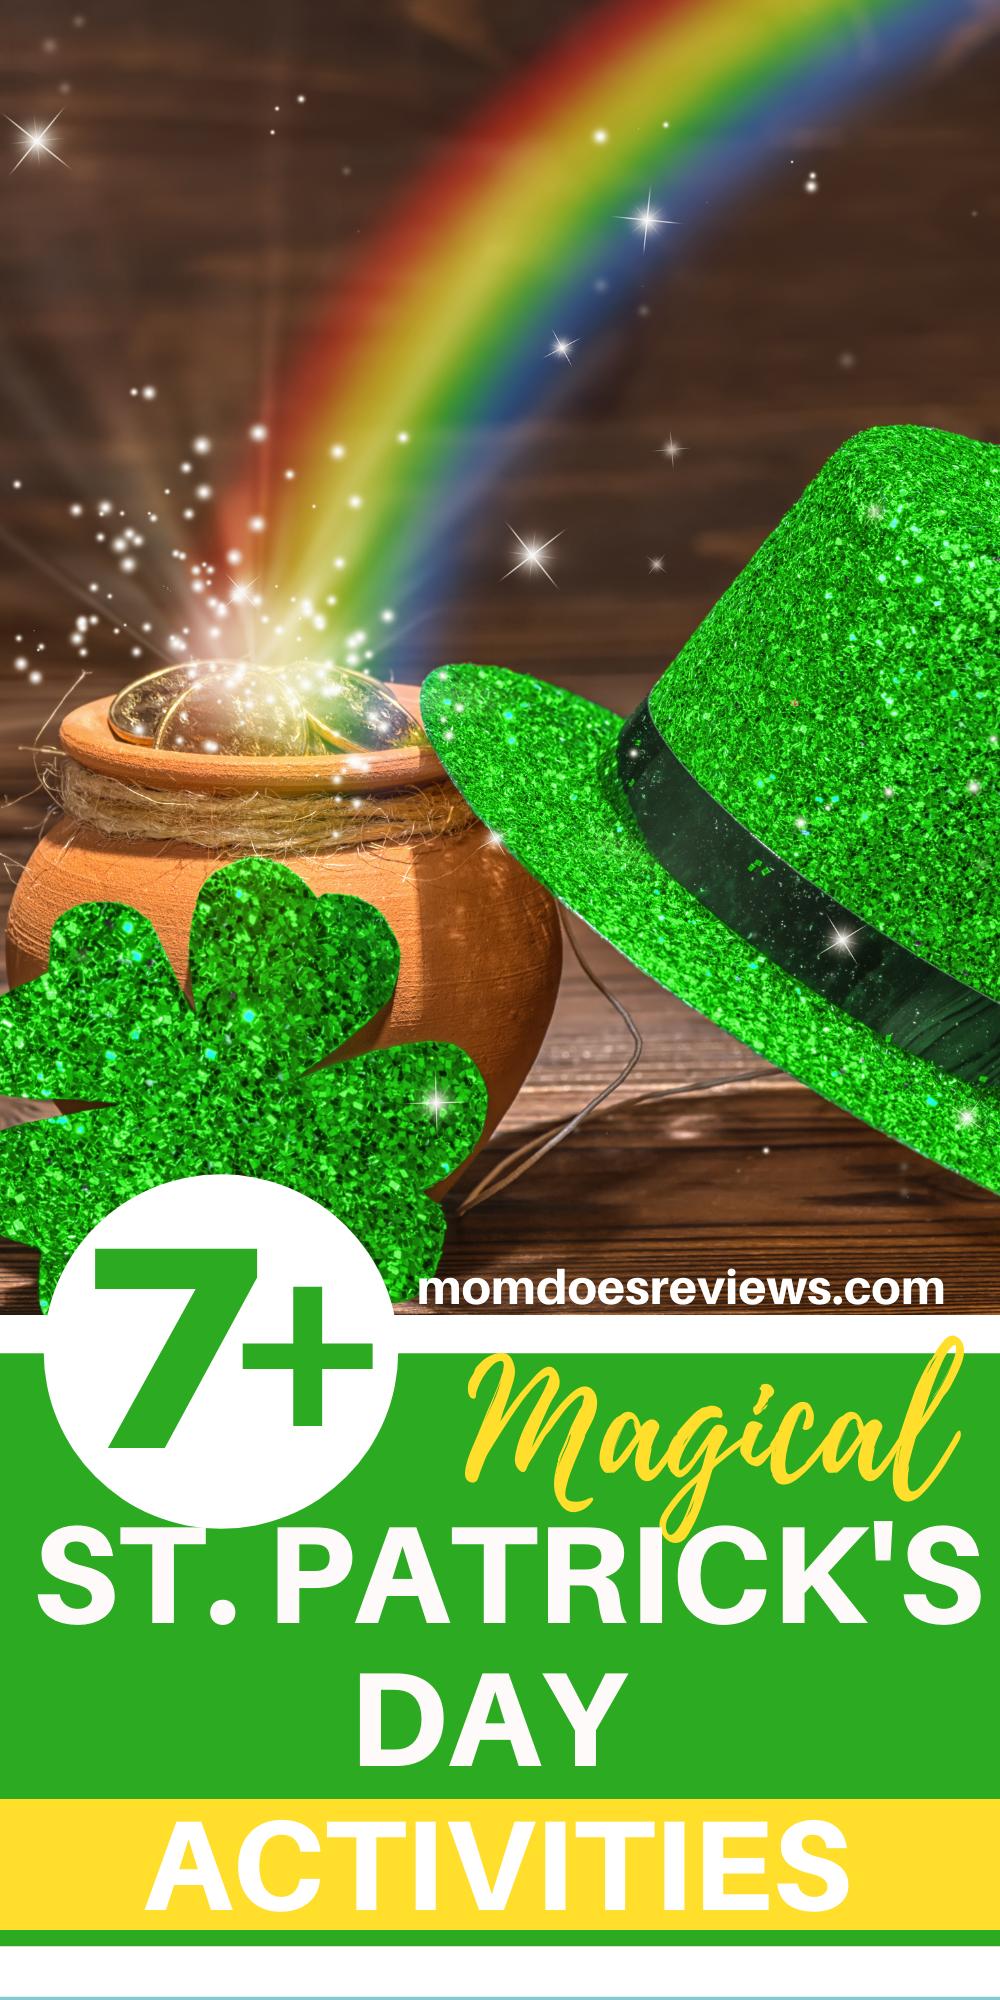 7 St. Patrick's Day Activities